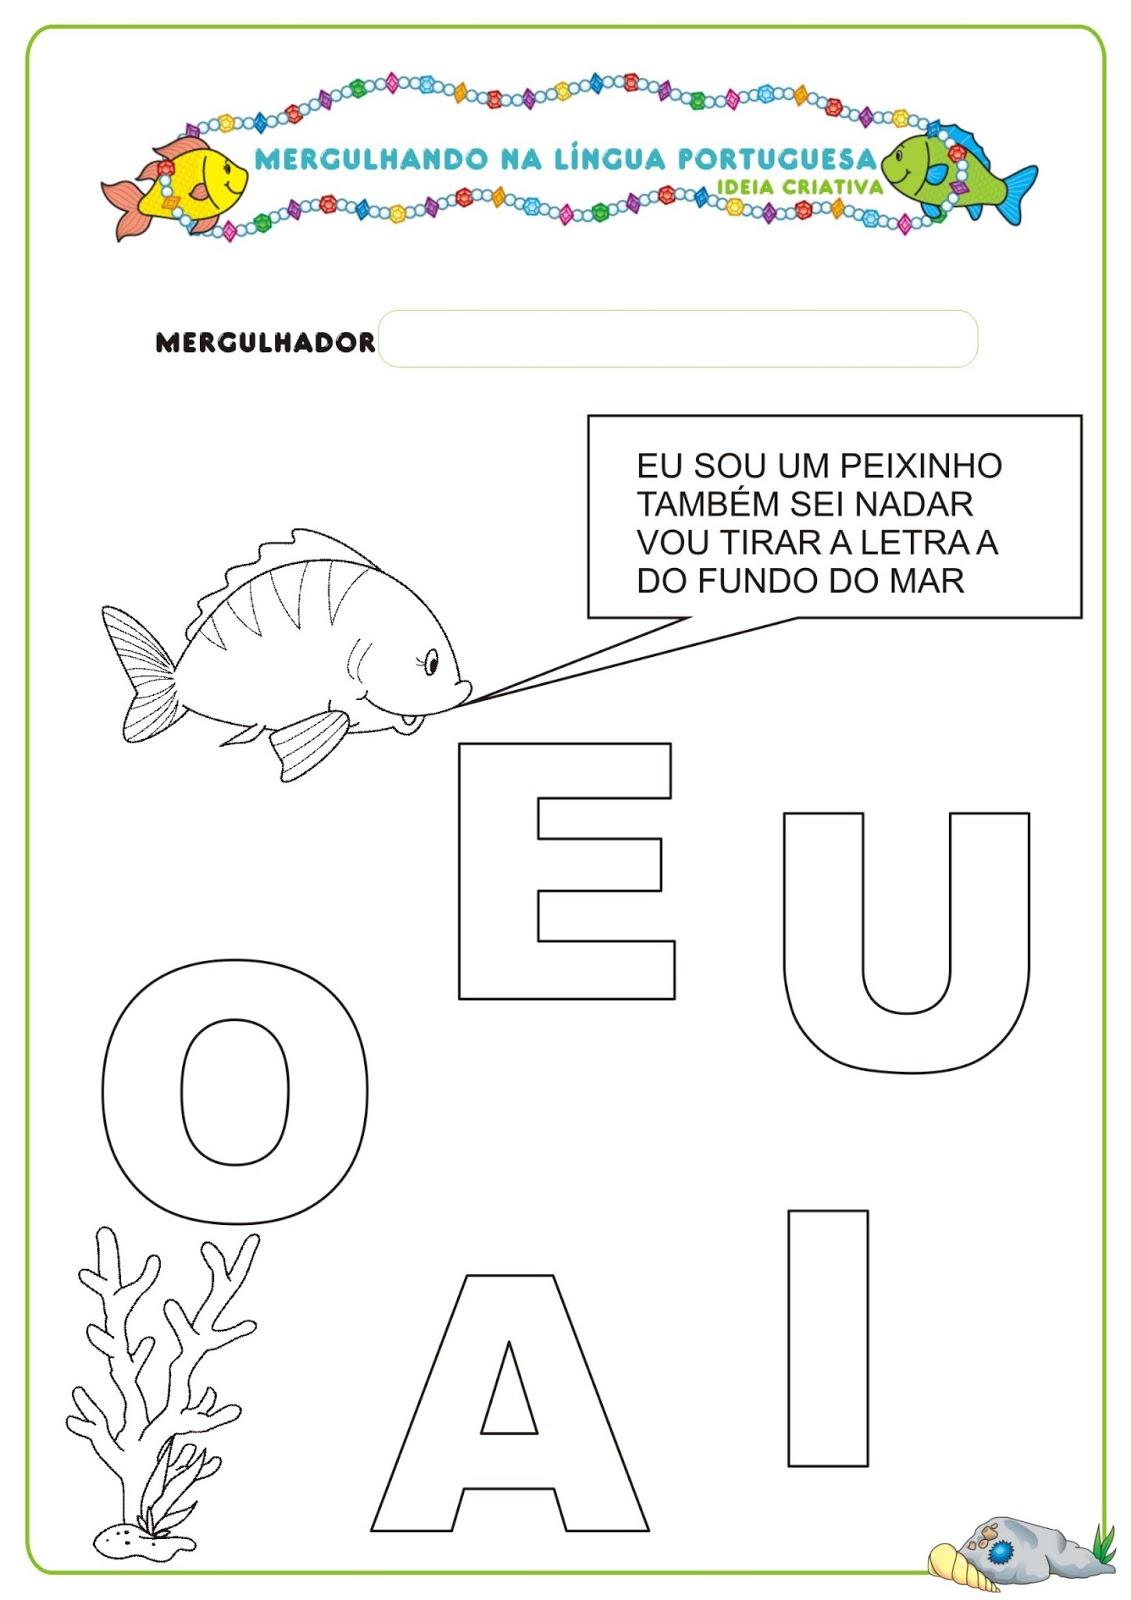 Top Caderno de Atividades Língua Portuguesa Projeto no Fundo do Mar  VC78